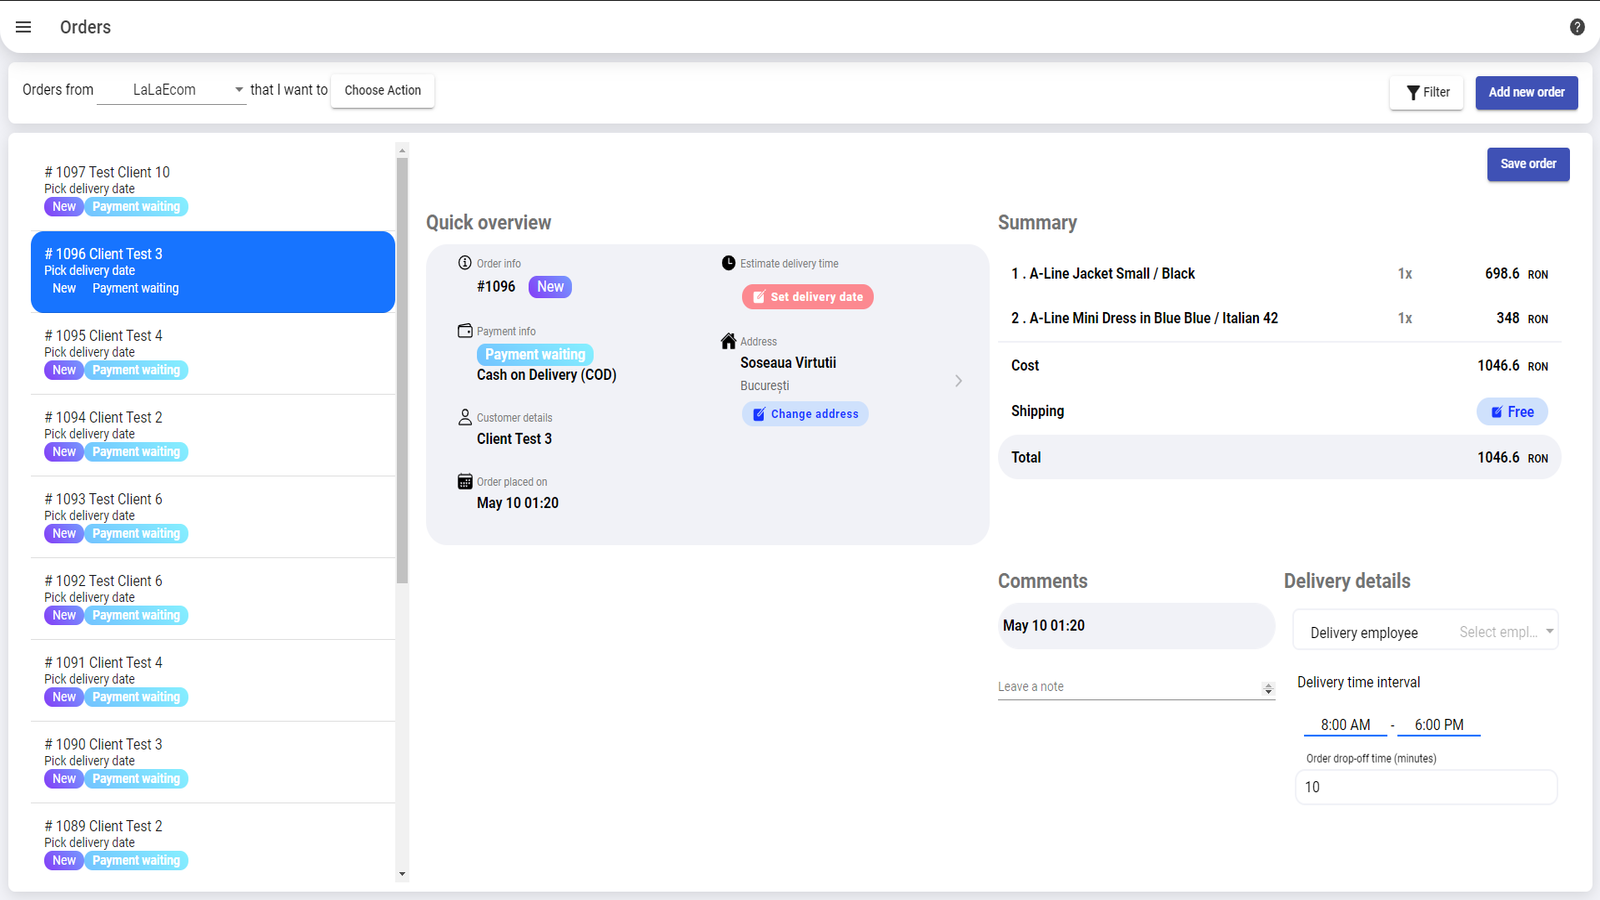 Logistia screenshot: Logistia order management